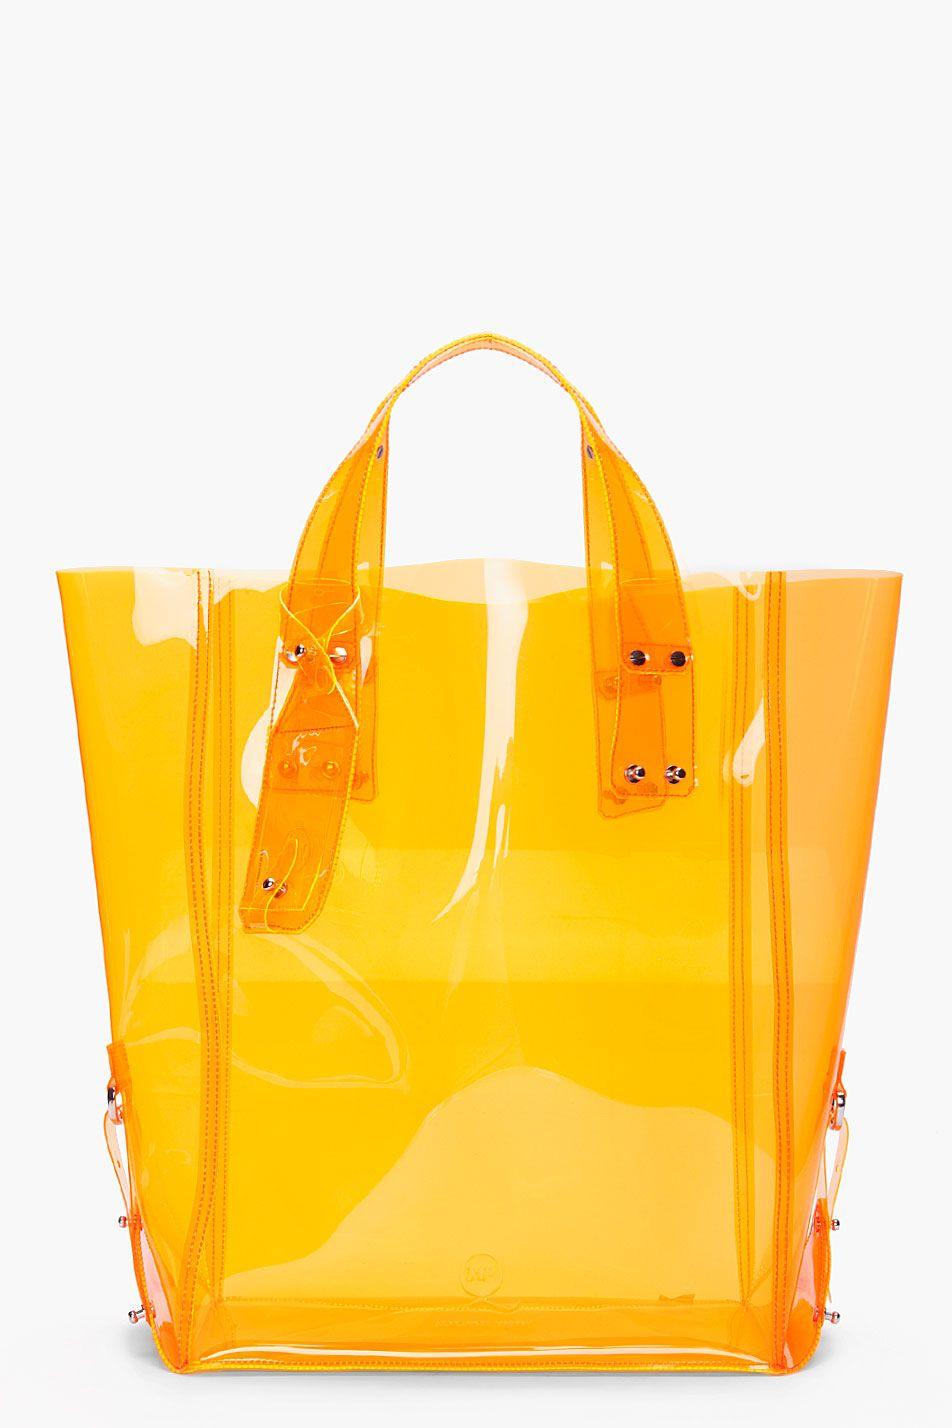 Pin By Shoshana Mazer On Bags Alexander Mcqueen Bag Shopping Tote Bags